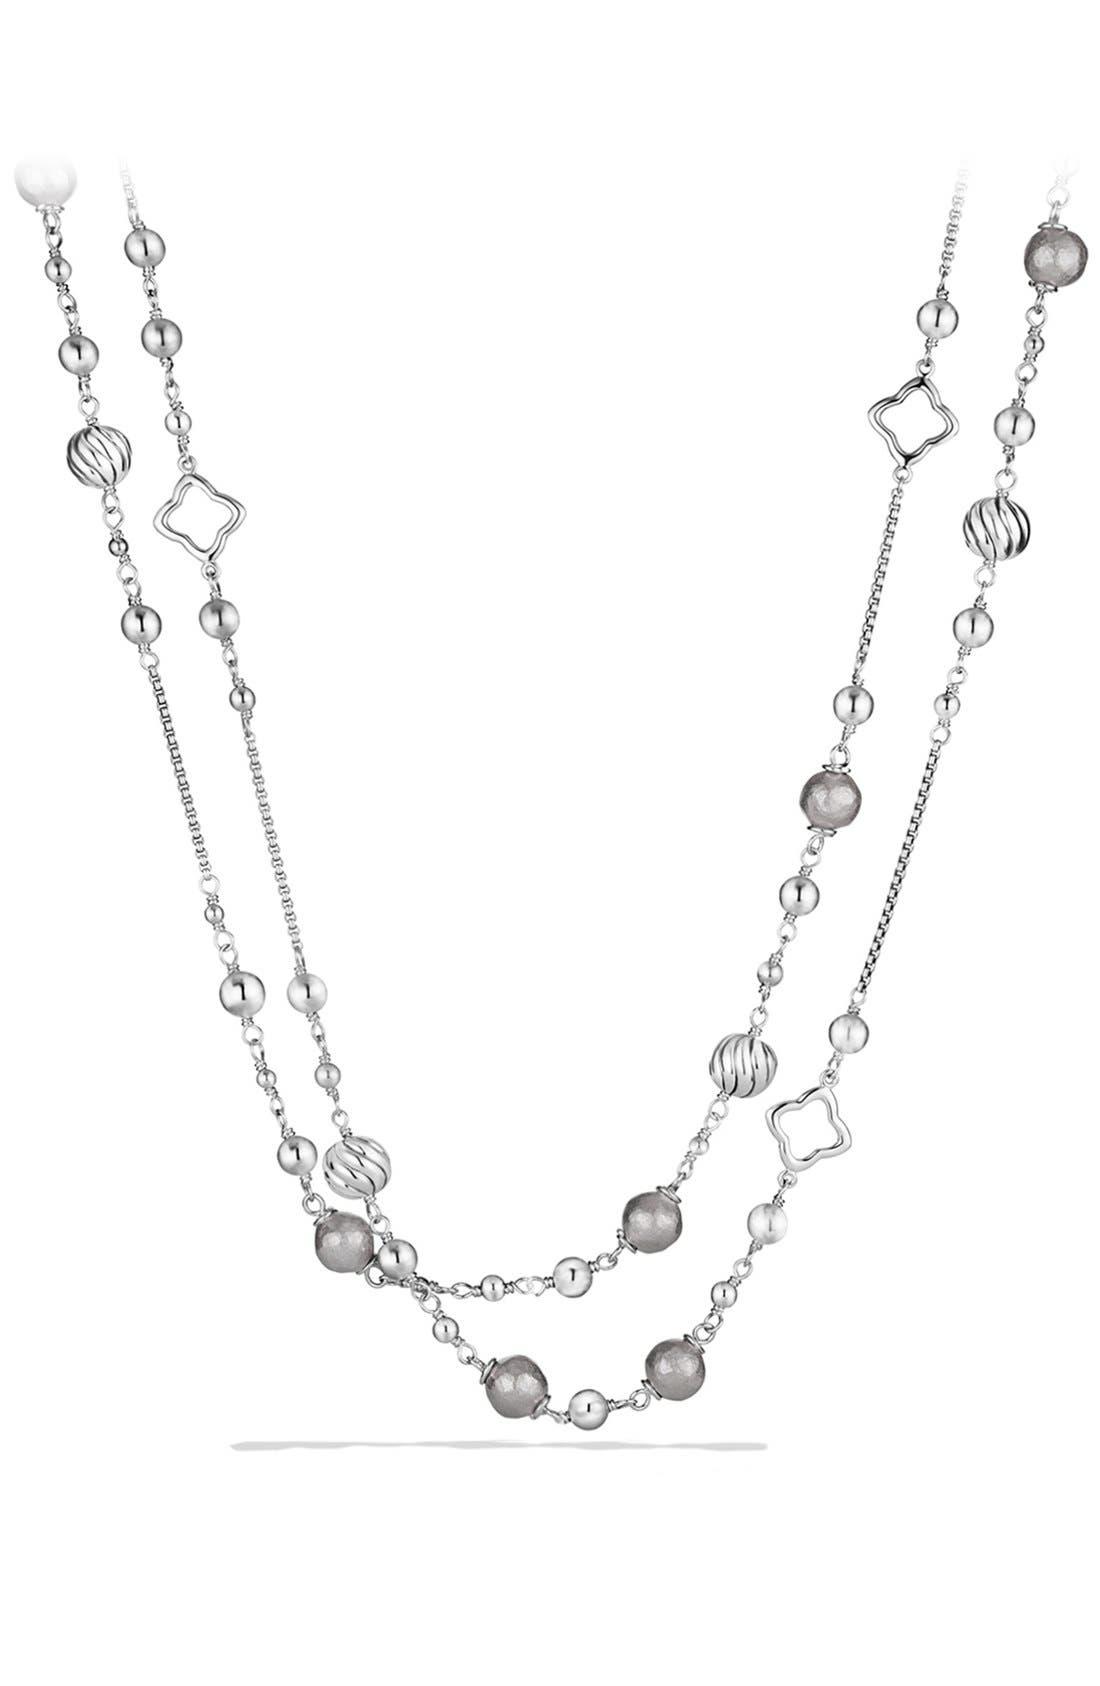 Main Image - David Yurman 'DY Elements' Chain Necklace